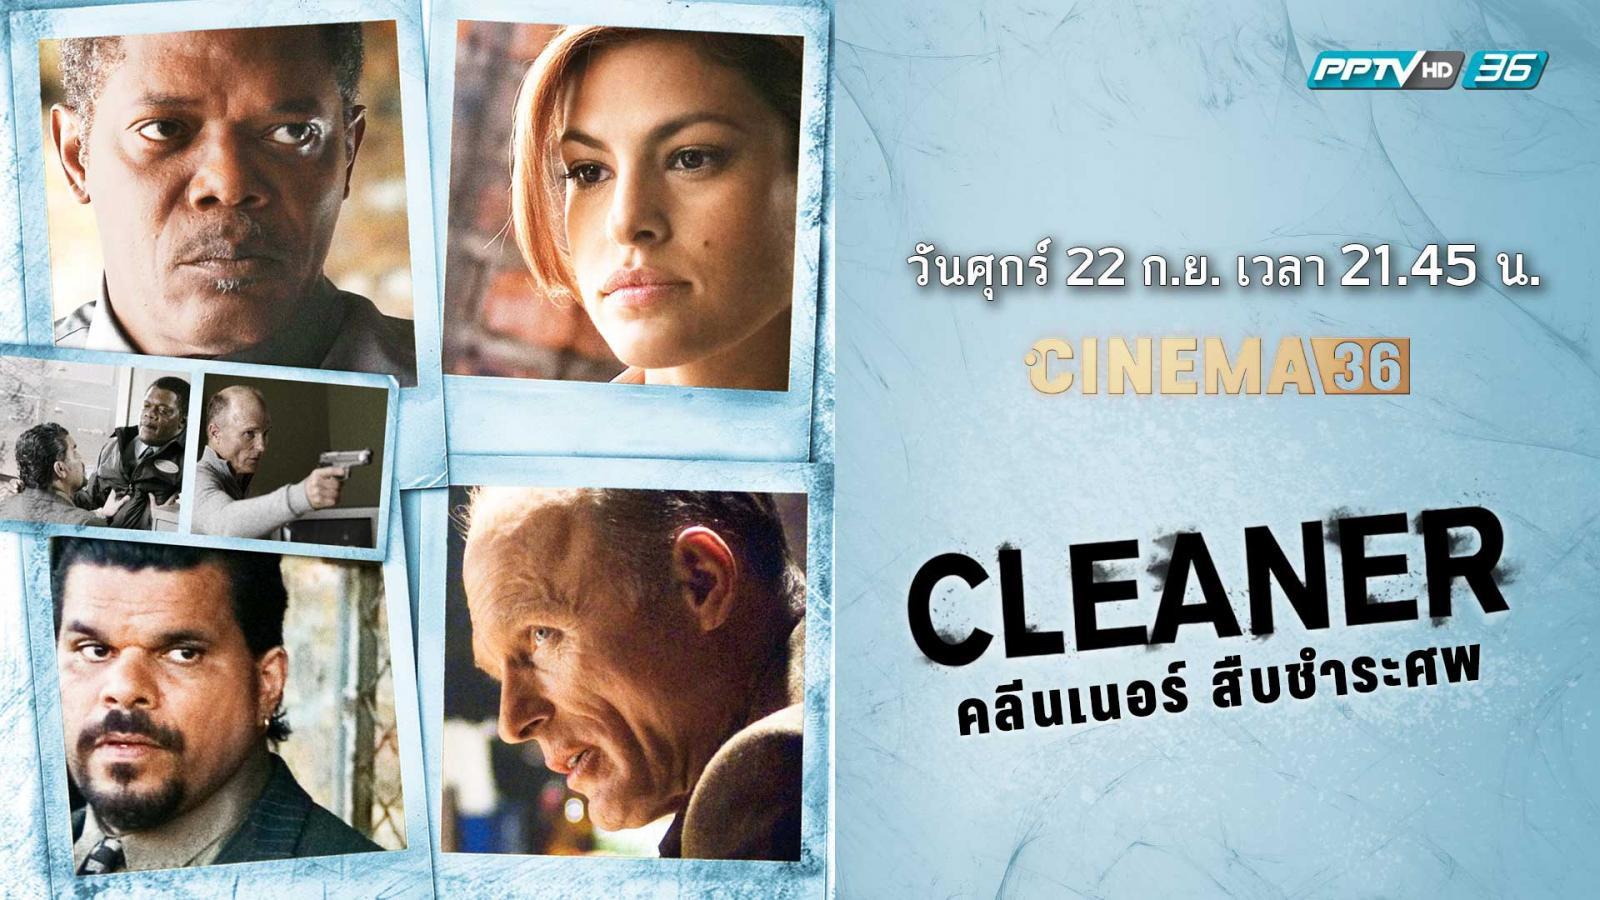 """CLEANER"" คลีนเนอร์ สืบชำระศพ"